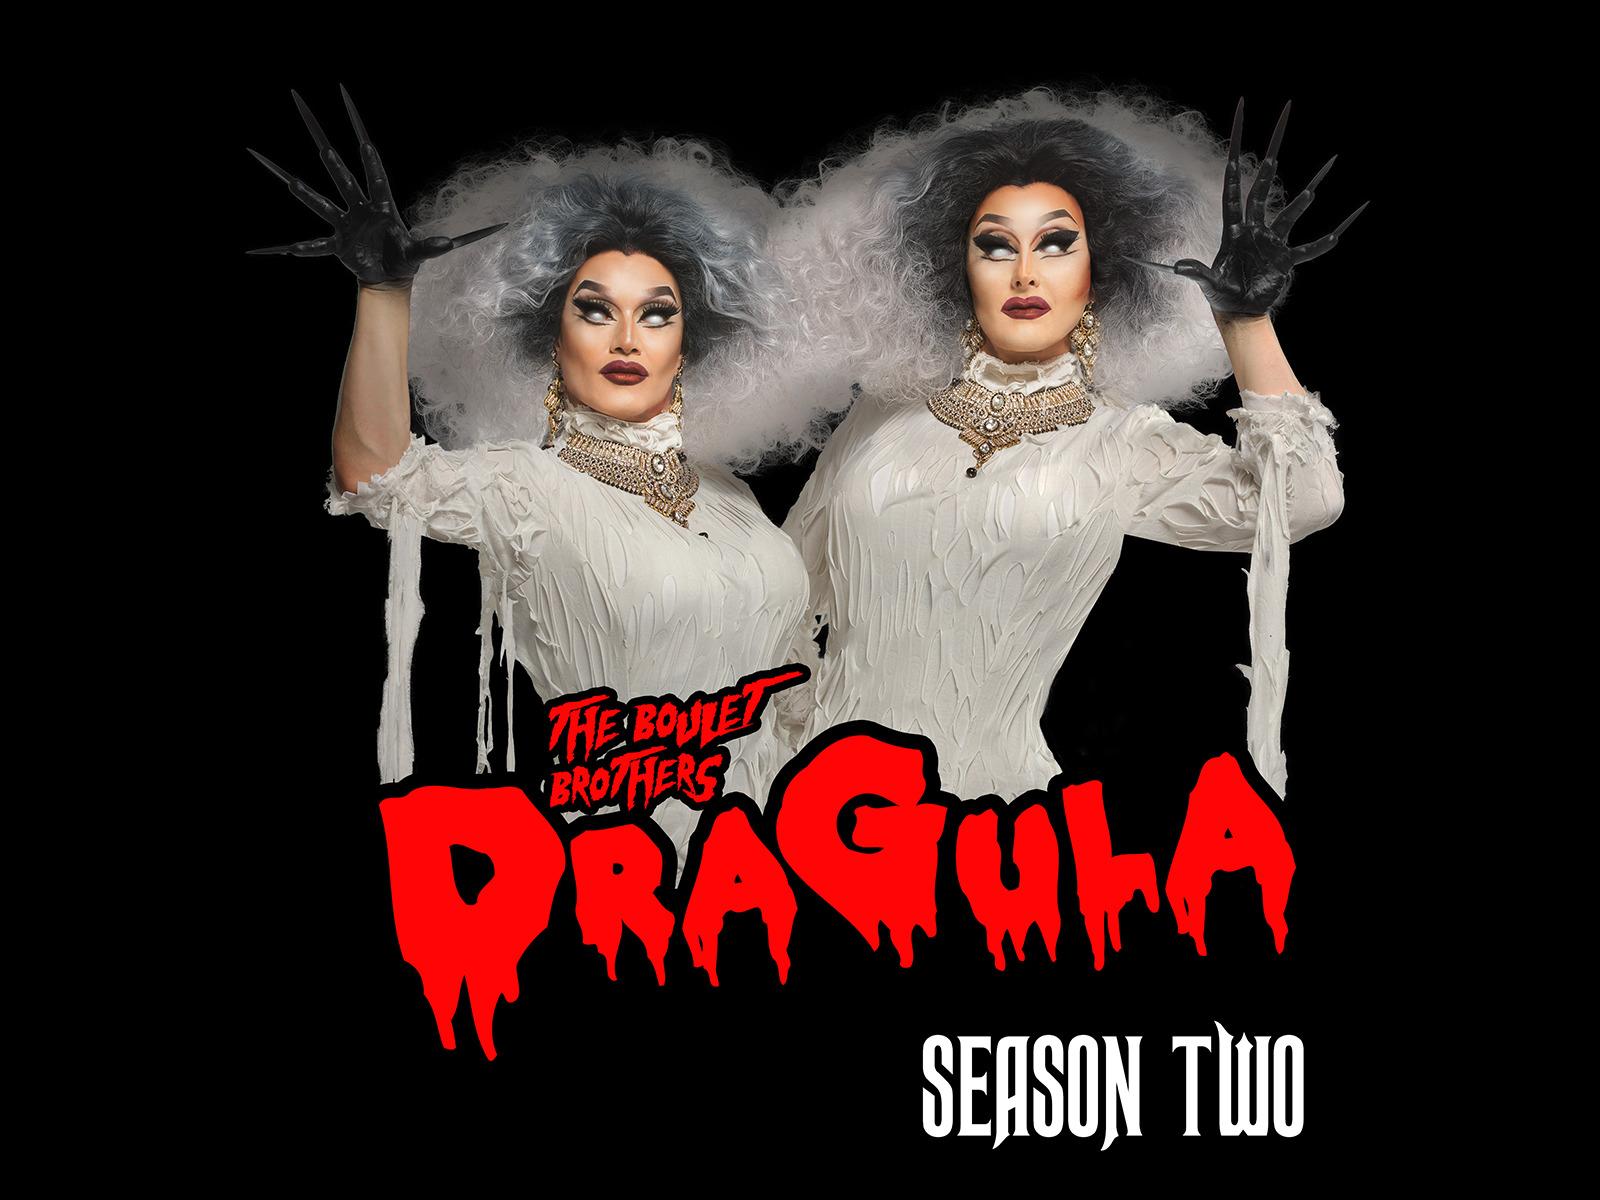 Watch Boulet Brothers Dragula Season 2 Episode 10: Episode